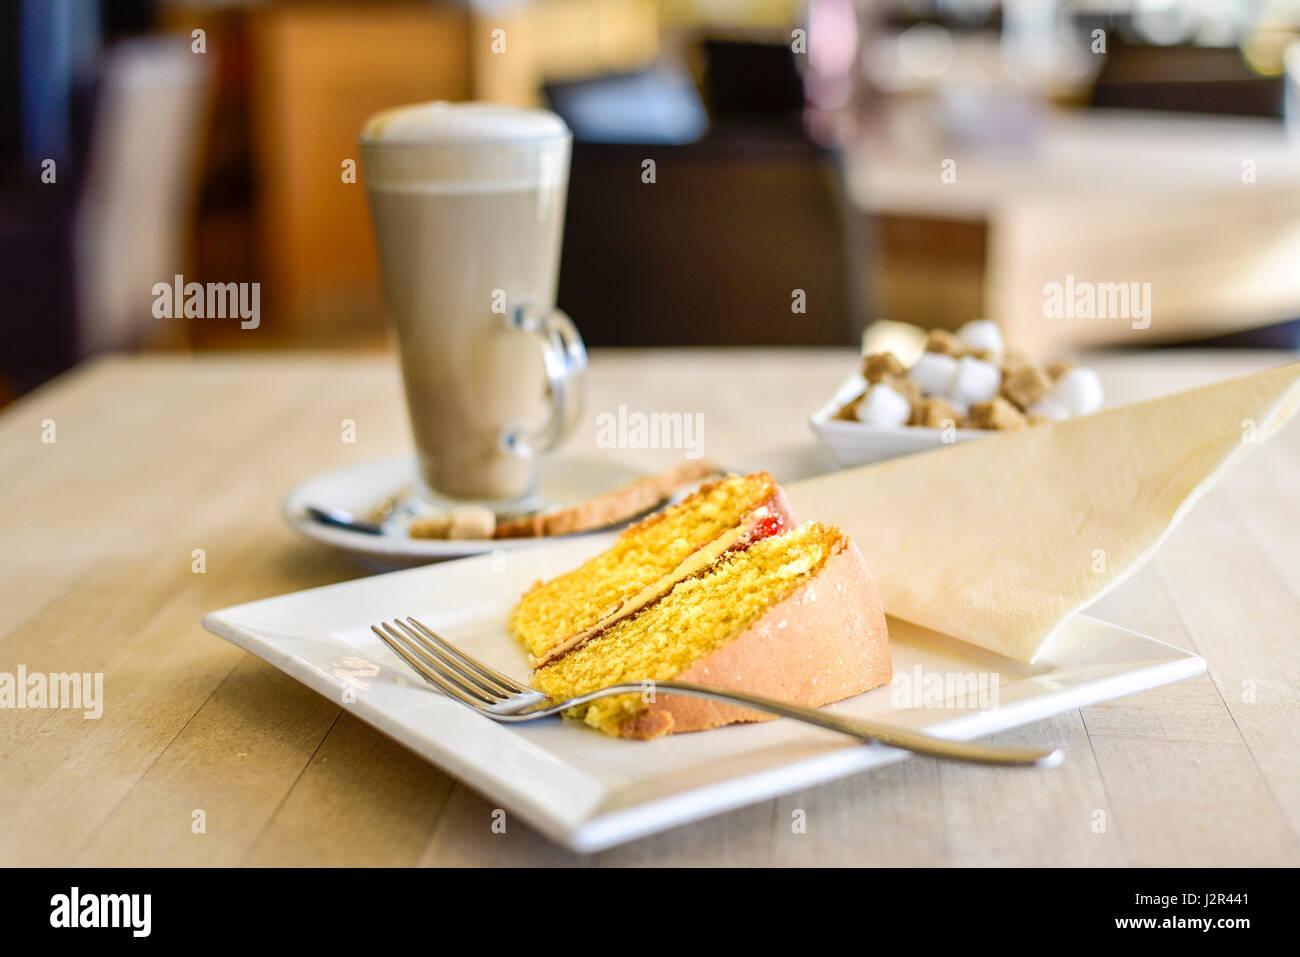 Food Coffee and cake Victoria Sponge Cake Sweet Treat Afternoon treat Indulgence Dessert Baked Pudding Baking Fork - Stock Image